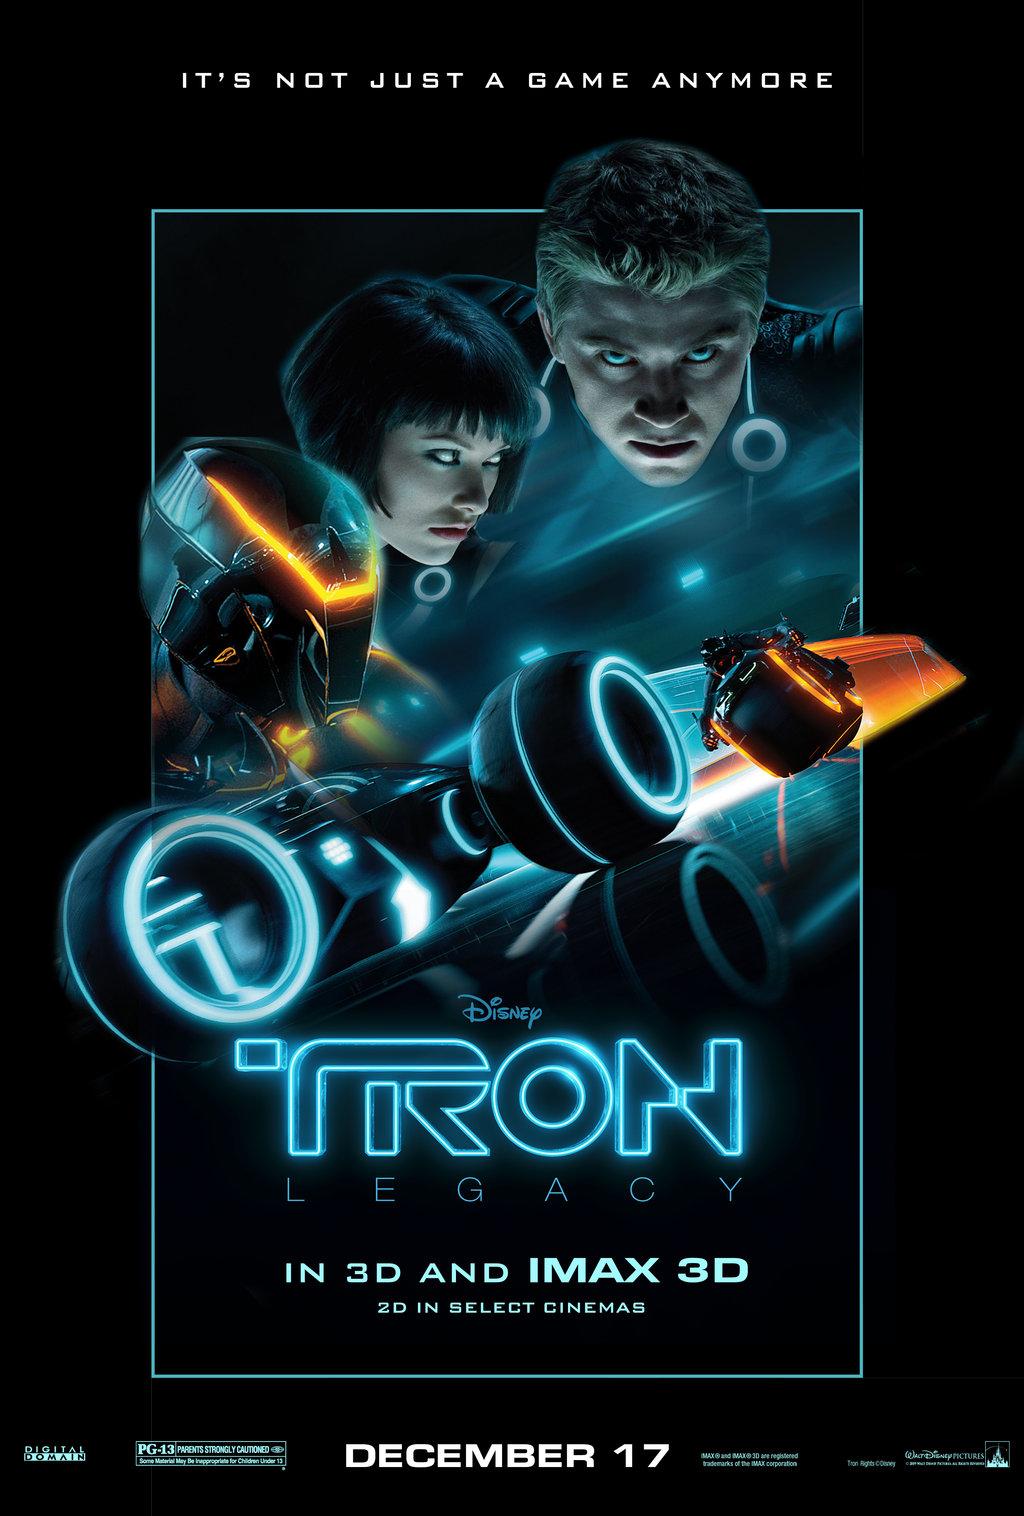 http://4.bp.blogspot.com/_ihrQmZh5NhQ/TH81V1jnxtI/AAAAAAAAALM/bQdxDk5qqhw/s1600/Tron+legacy+floating+heads+poster.jpg